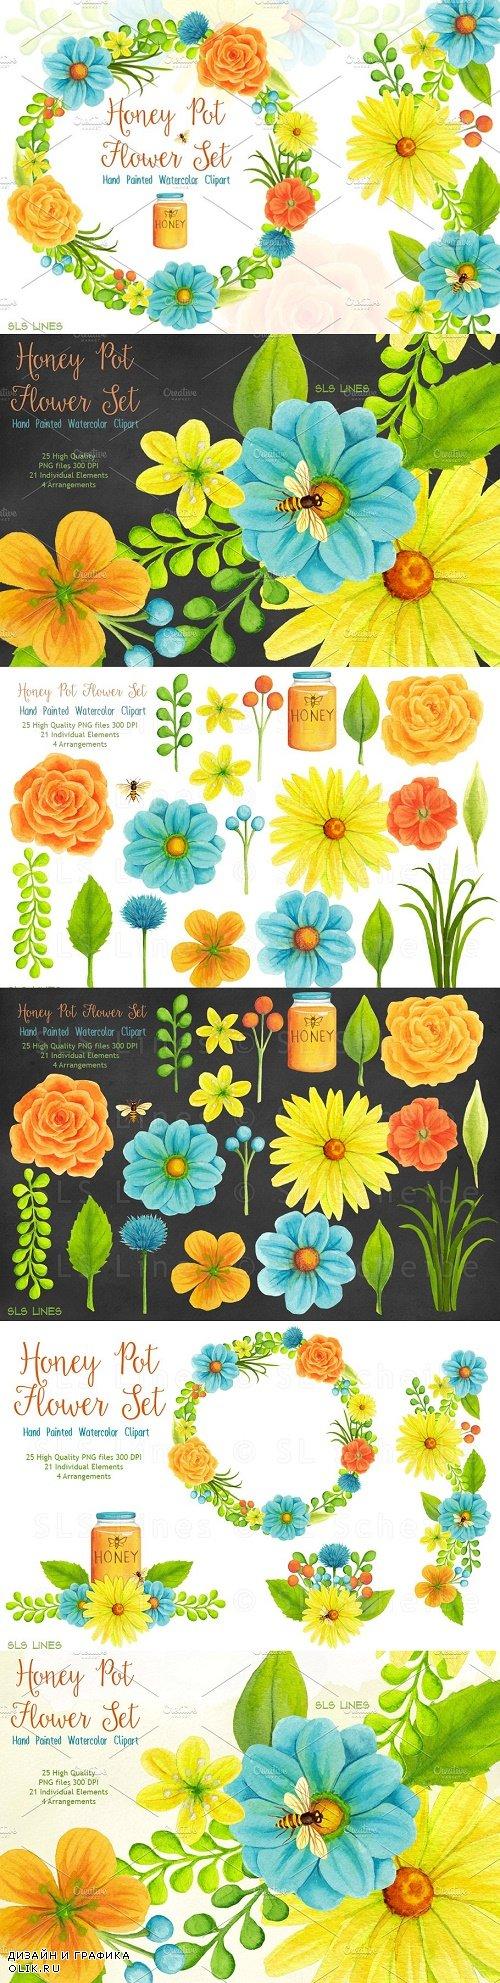 Honey Pot Flower Set - 412711